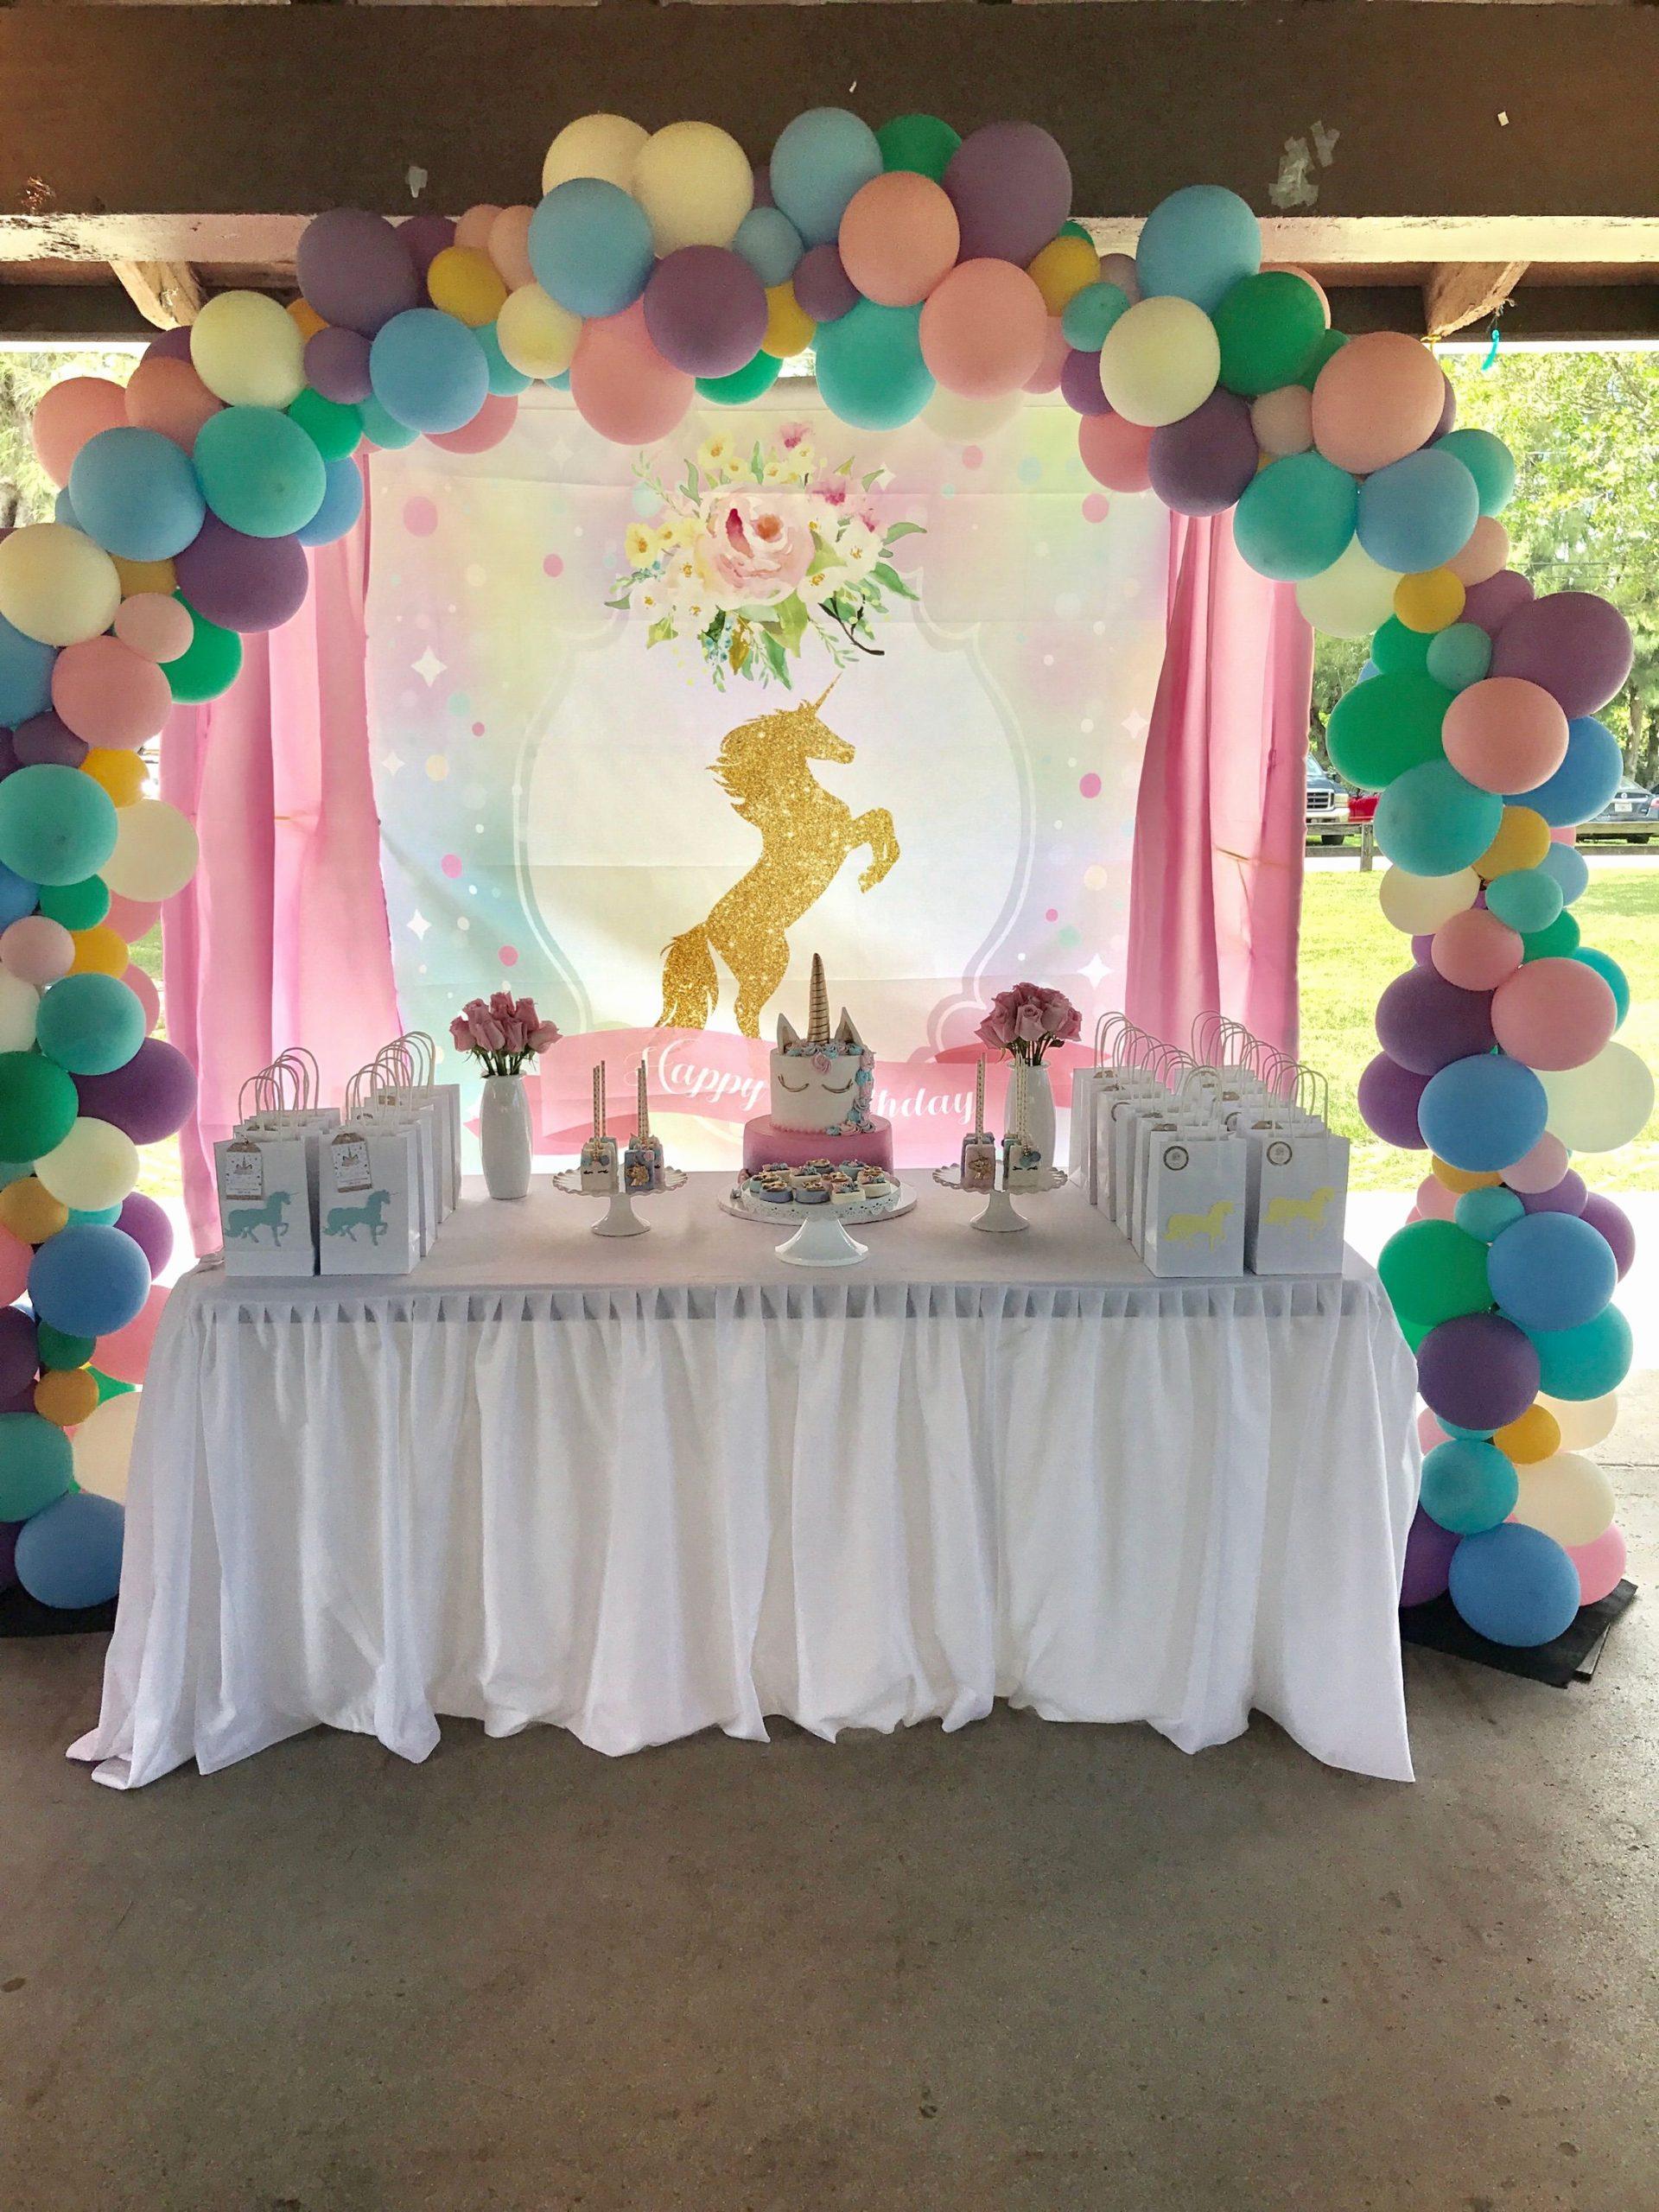 Banquet Hall Birthday Decoration Ideas Luxury Unicorn Birthday Party by Premiere Party Rental